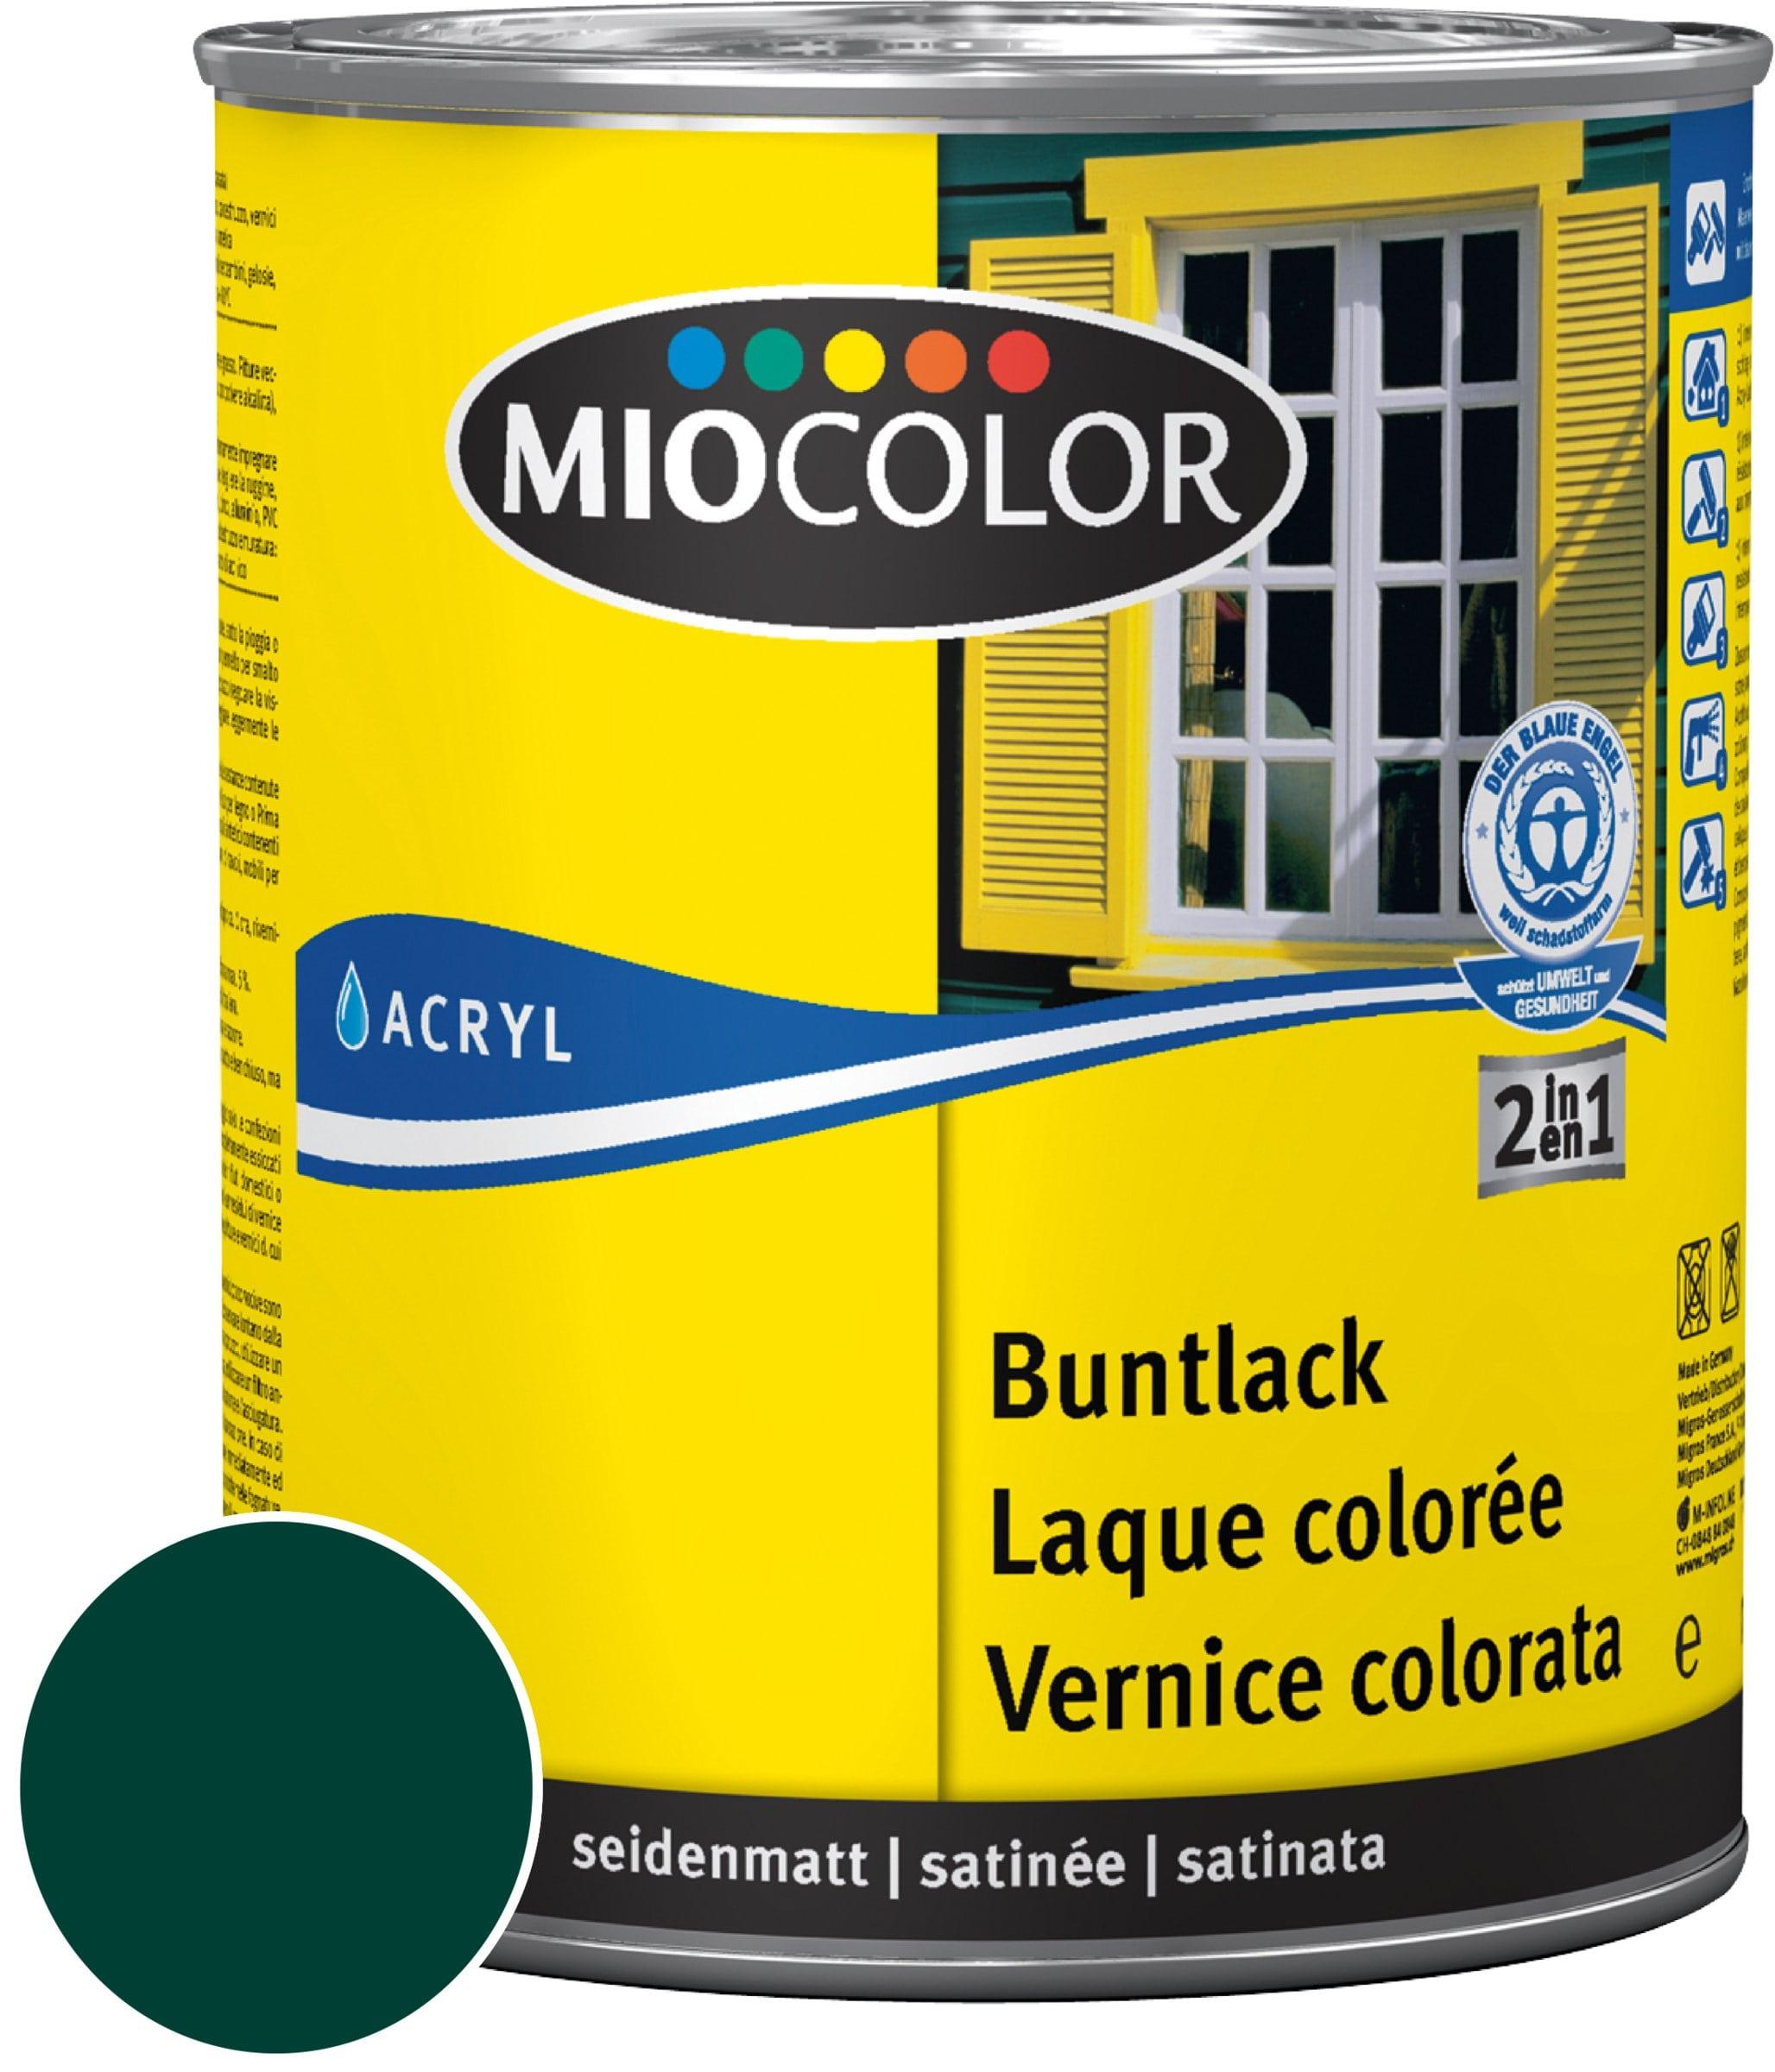 Miocolor Acryl Vernice colorata satinata Verde muschio 750 ml